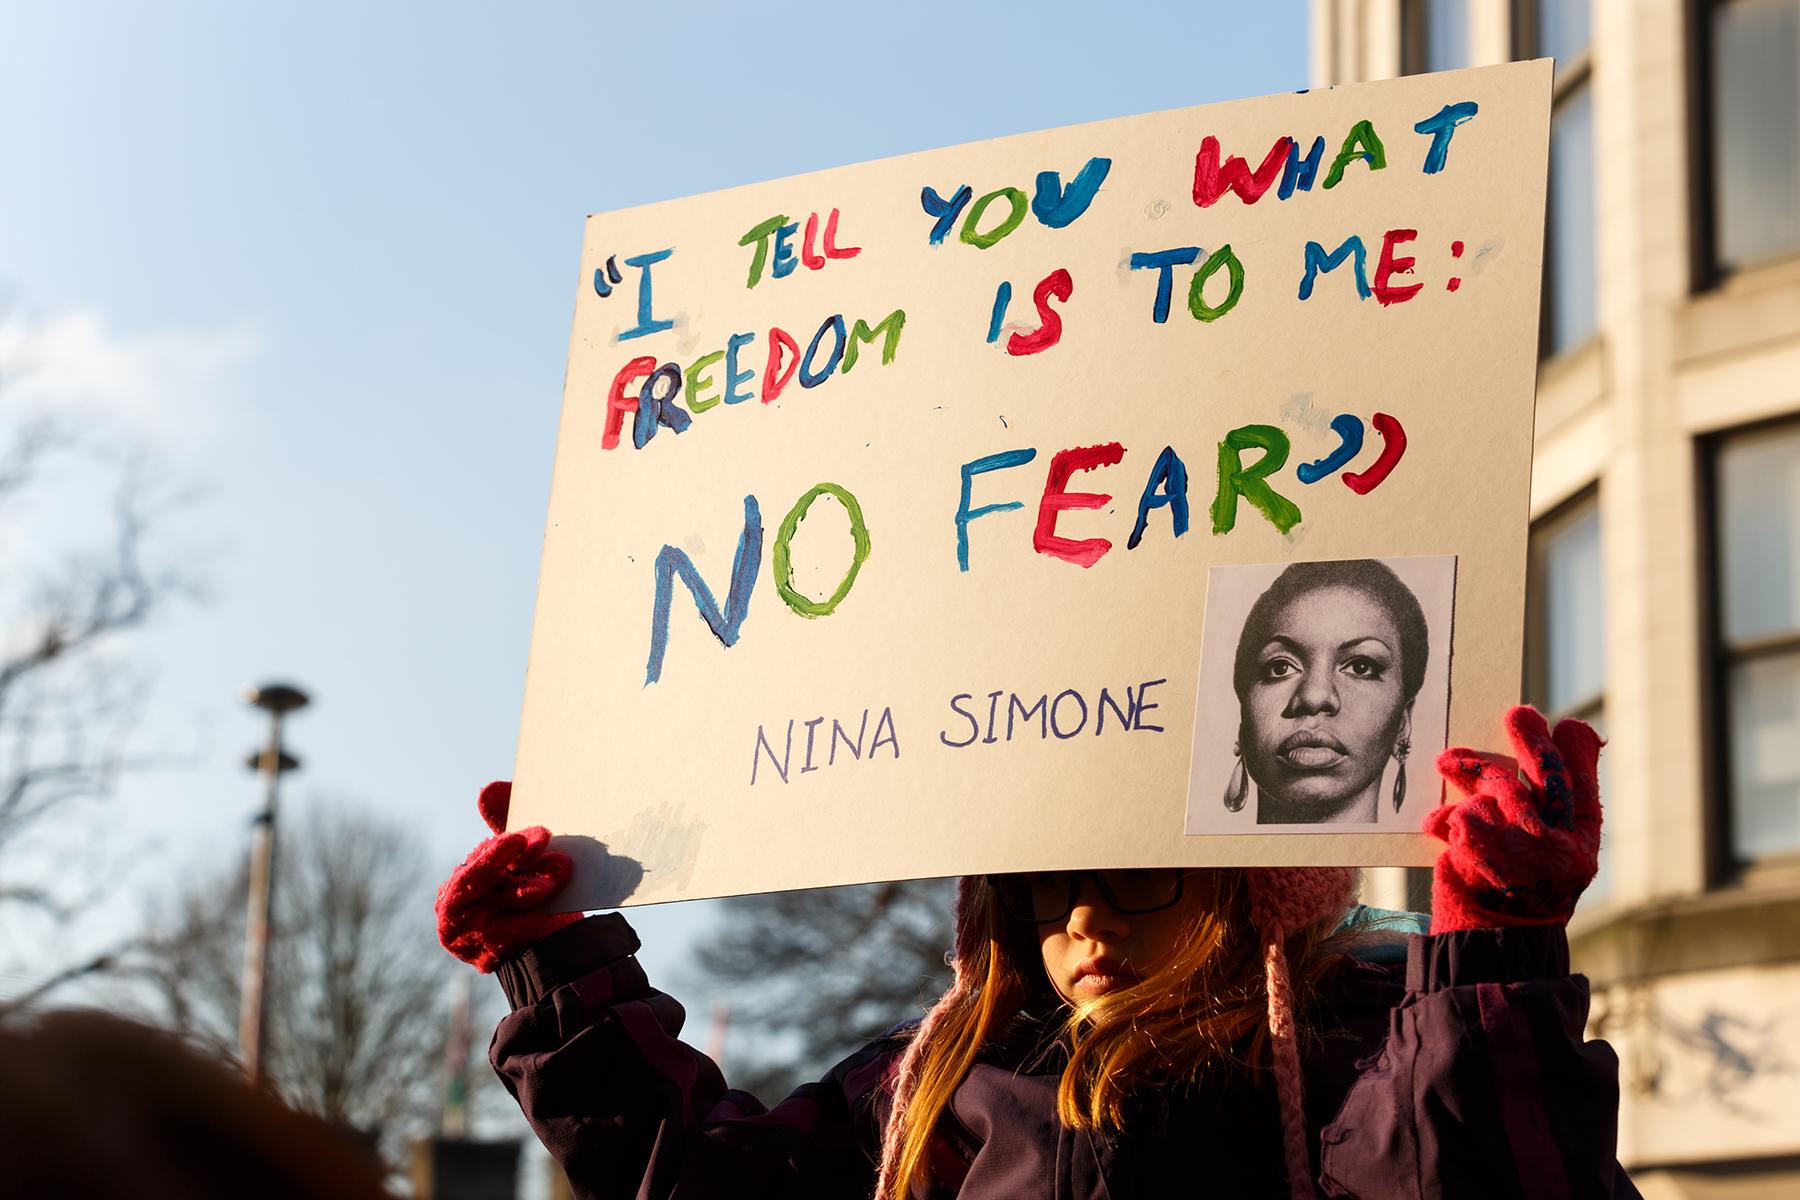 Tracey_Paddison_no_fear.jpg